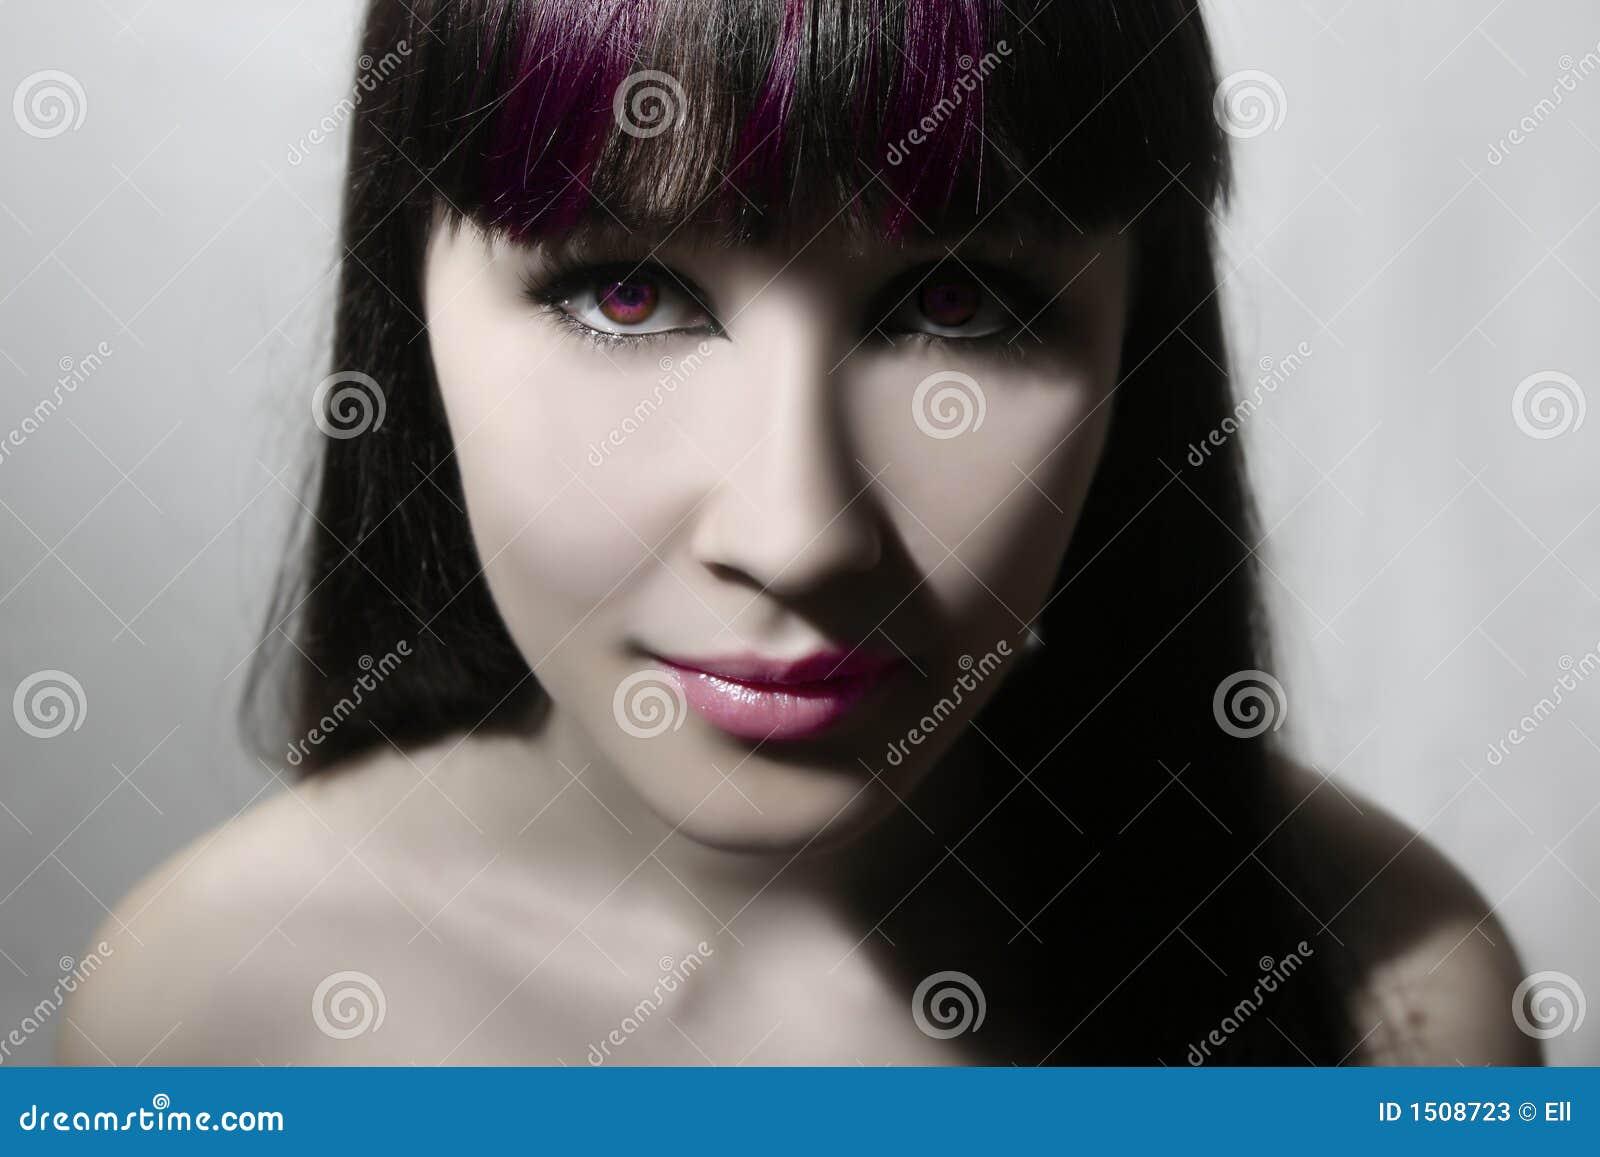 Perfect Girl.Com